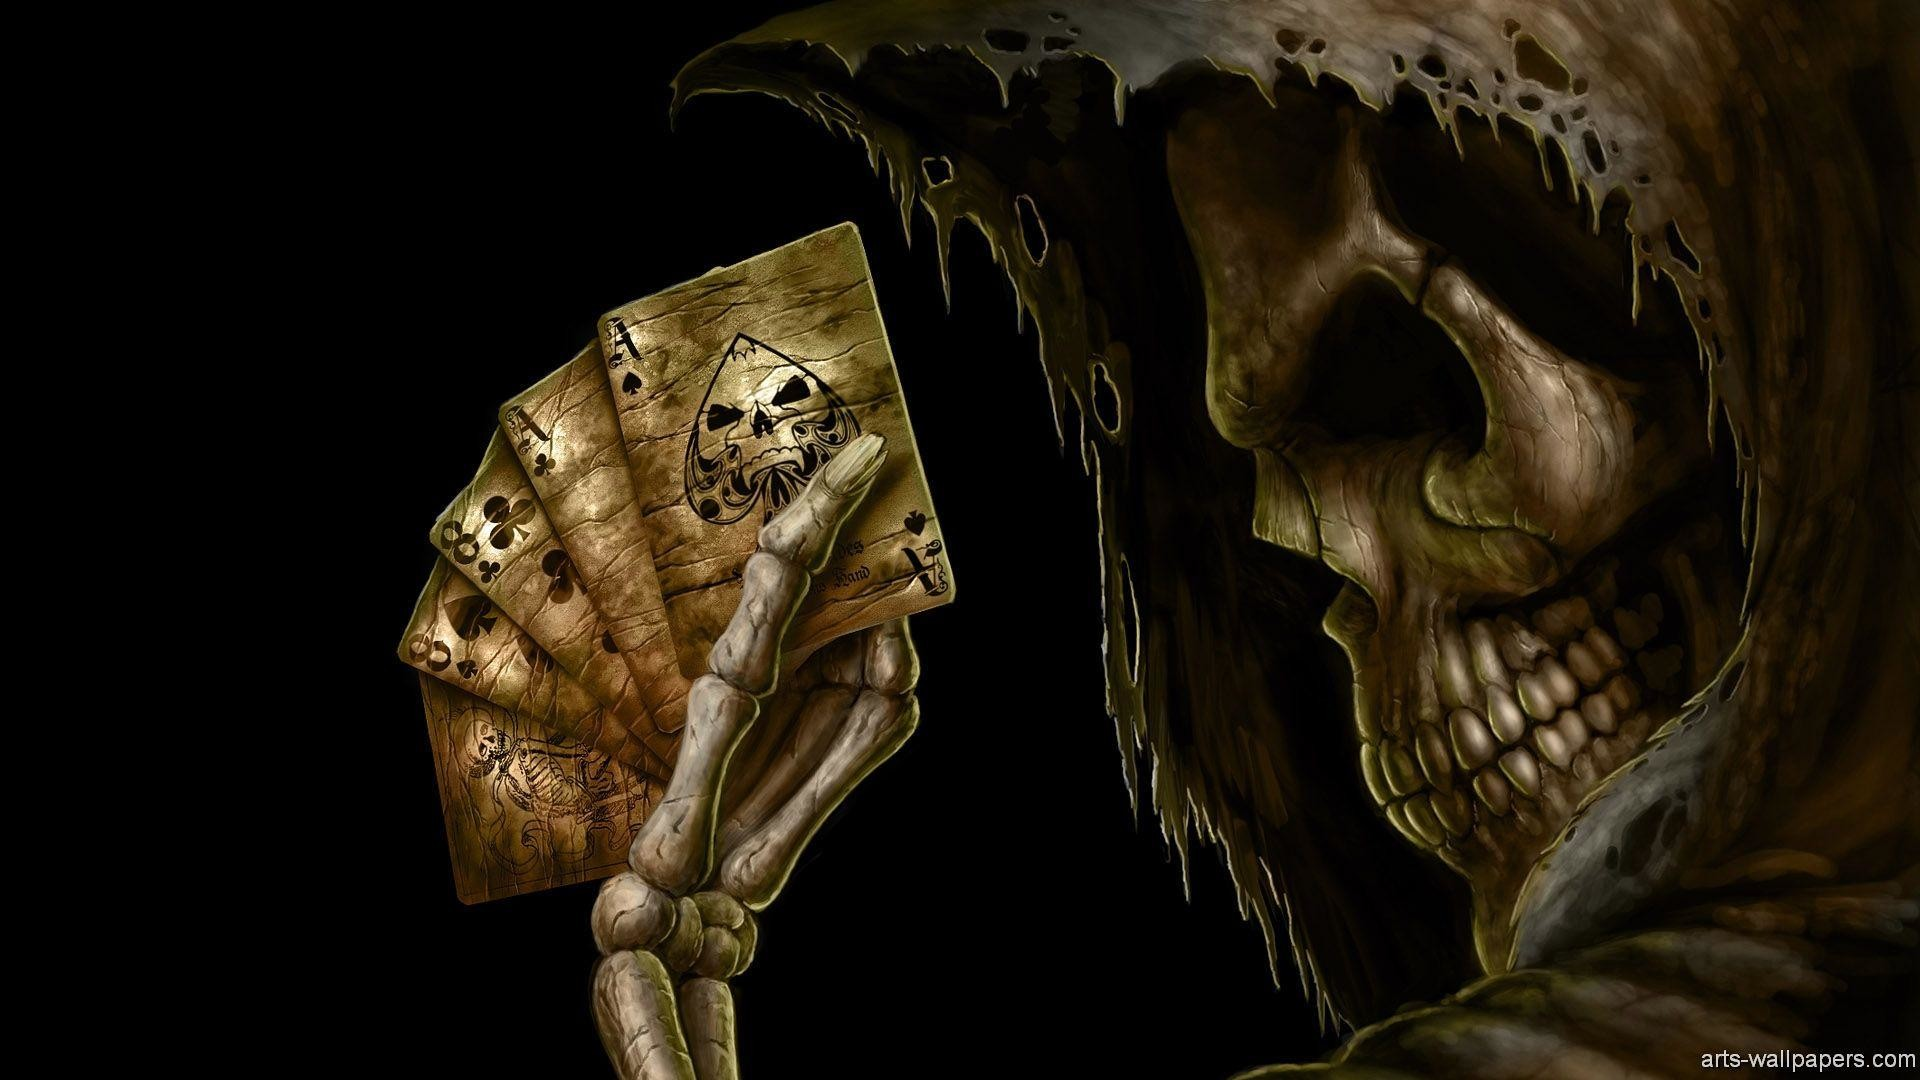 Mandalorian Skull Wallpaper Posted By Zoey Johnson